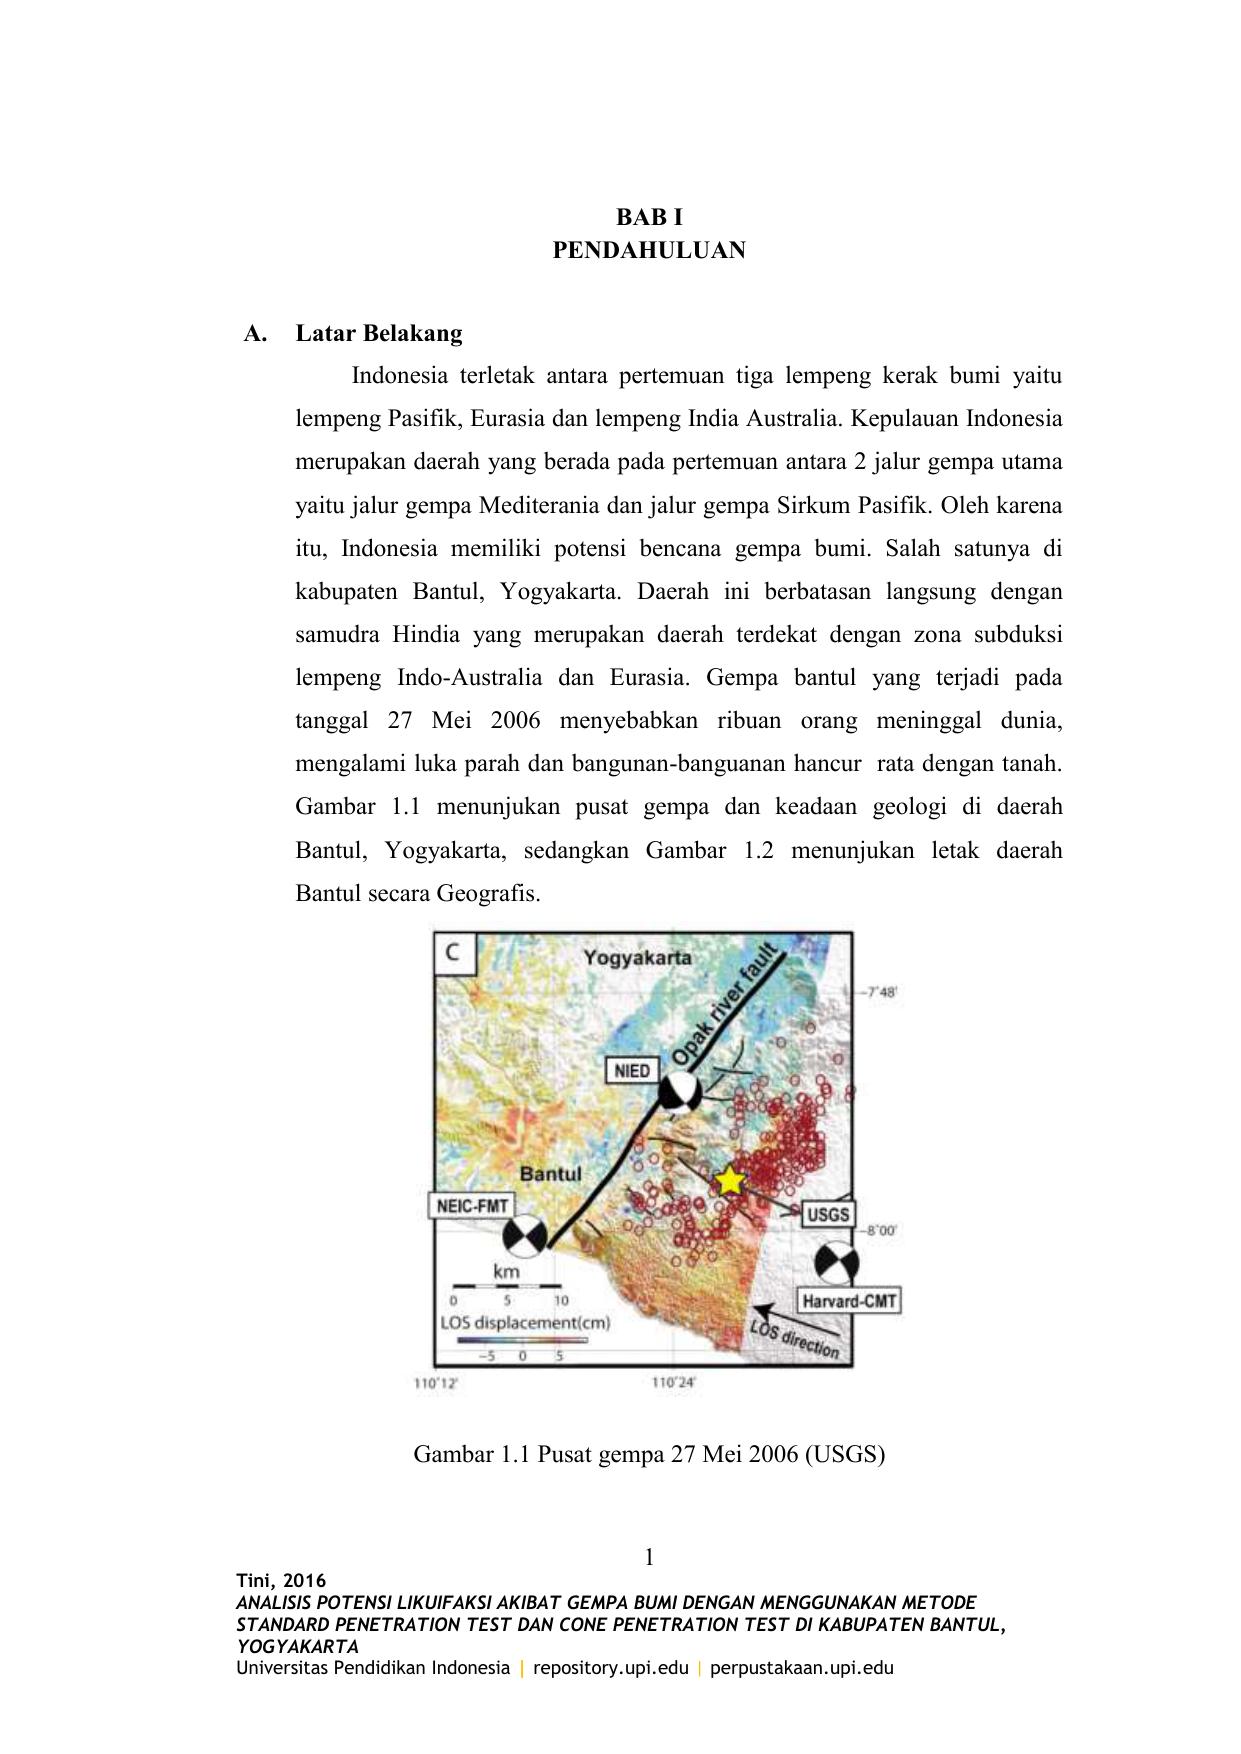 Contoh Proposal Penelitian Geografi Tentang Gempa Bumi Berbagi Contoh Proposal